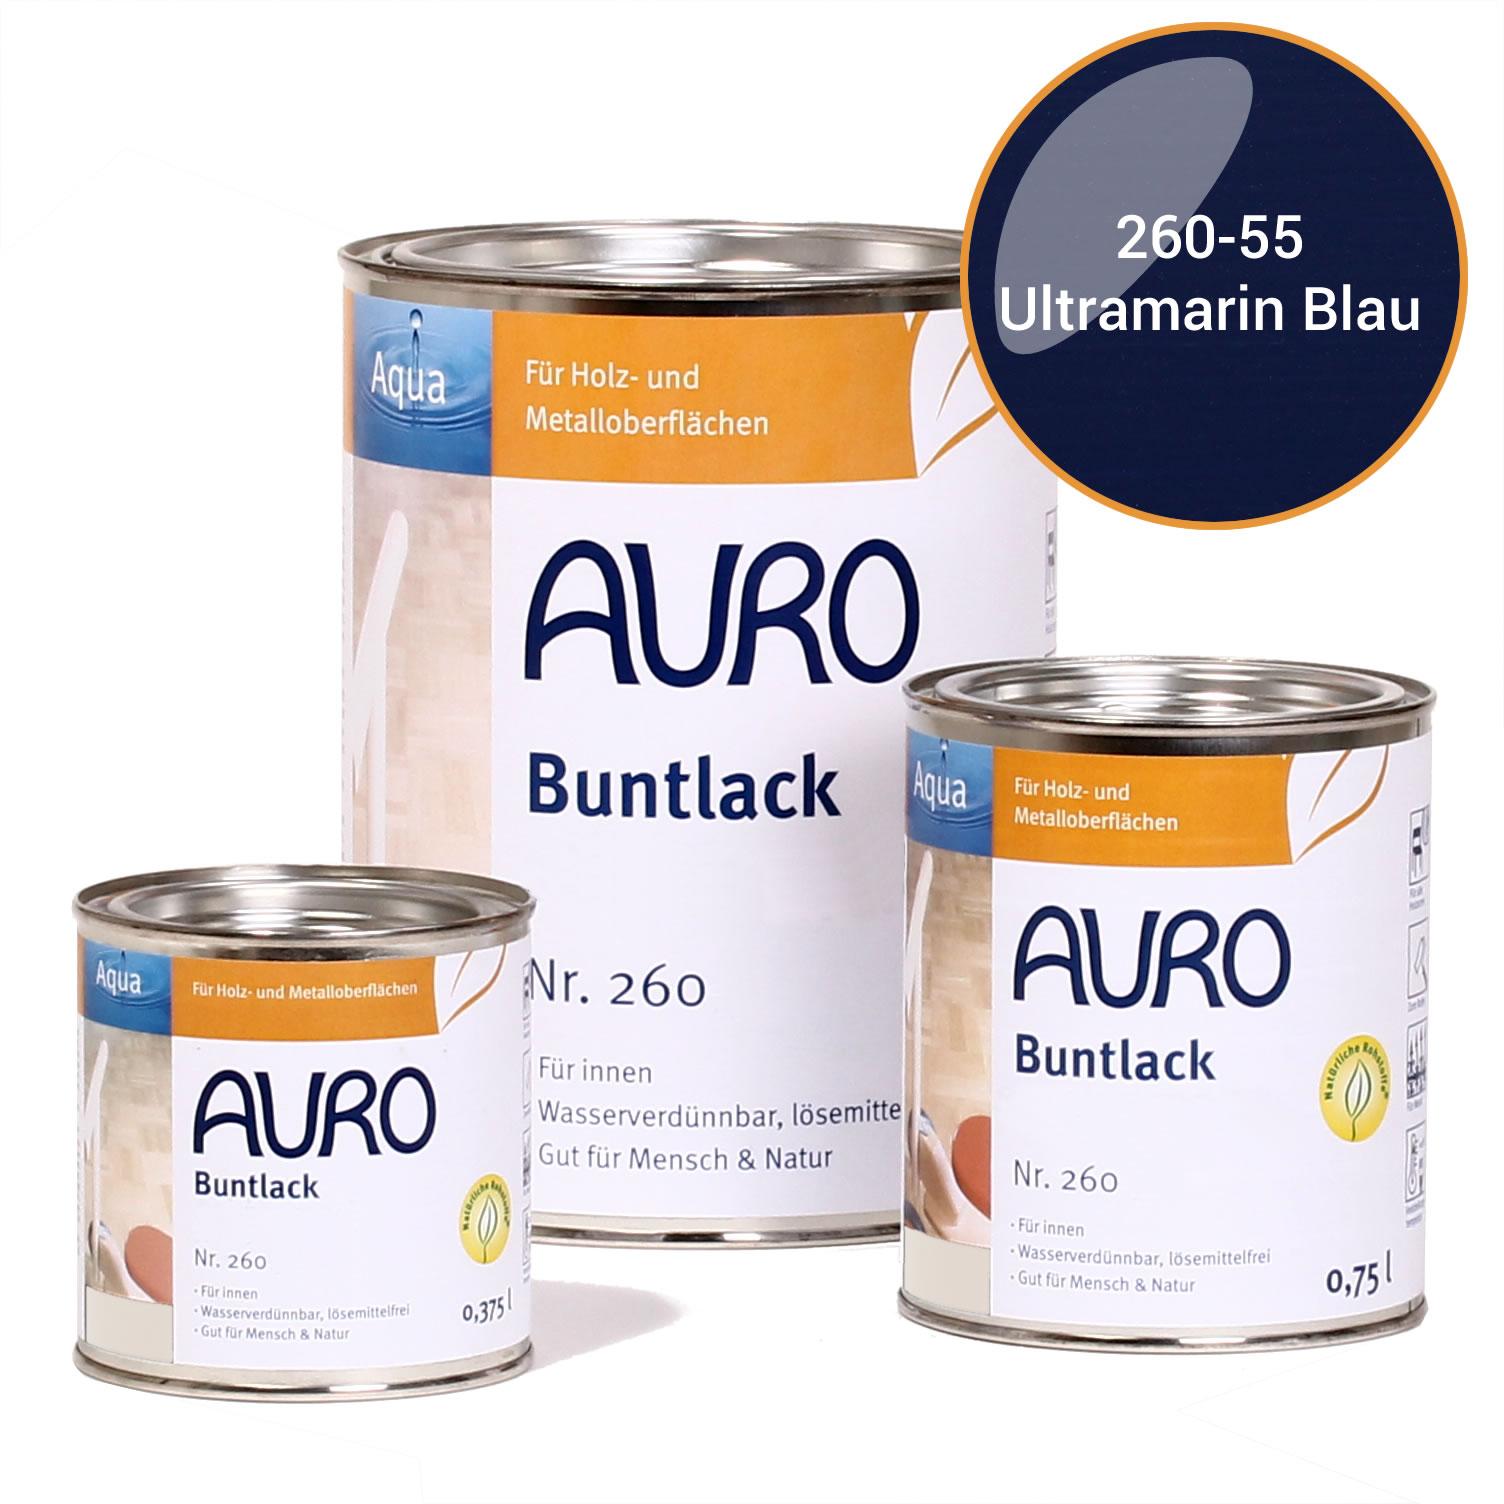 auro buntlack gl nzend nr 250 ultramarin blau. Black Bedroom Furniture Sets. Home Design Ideas